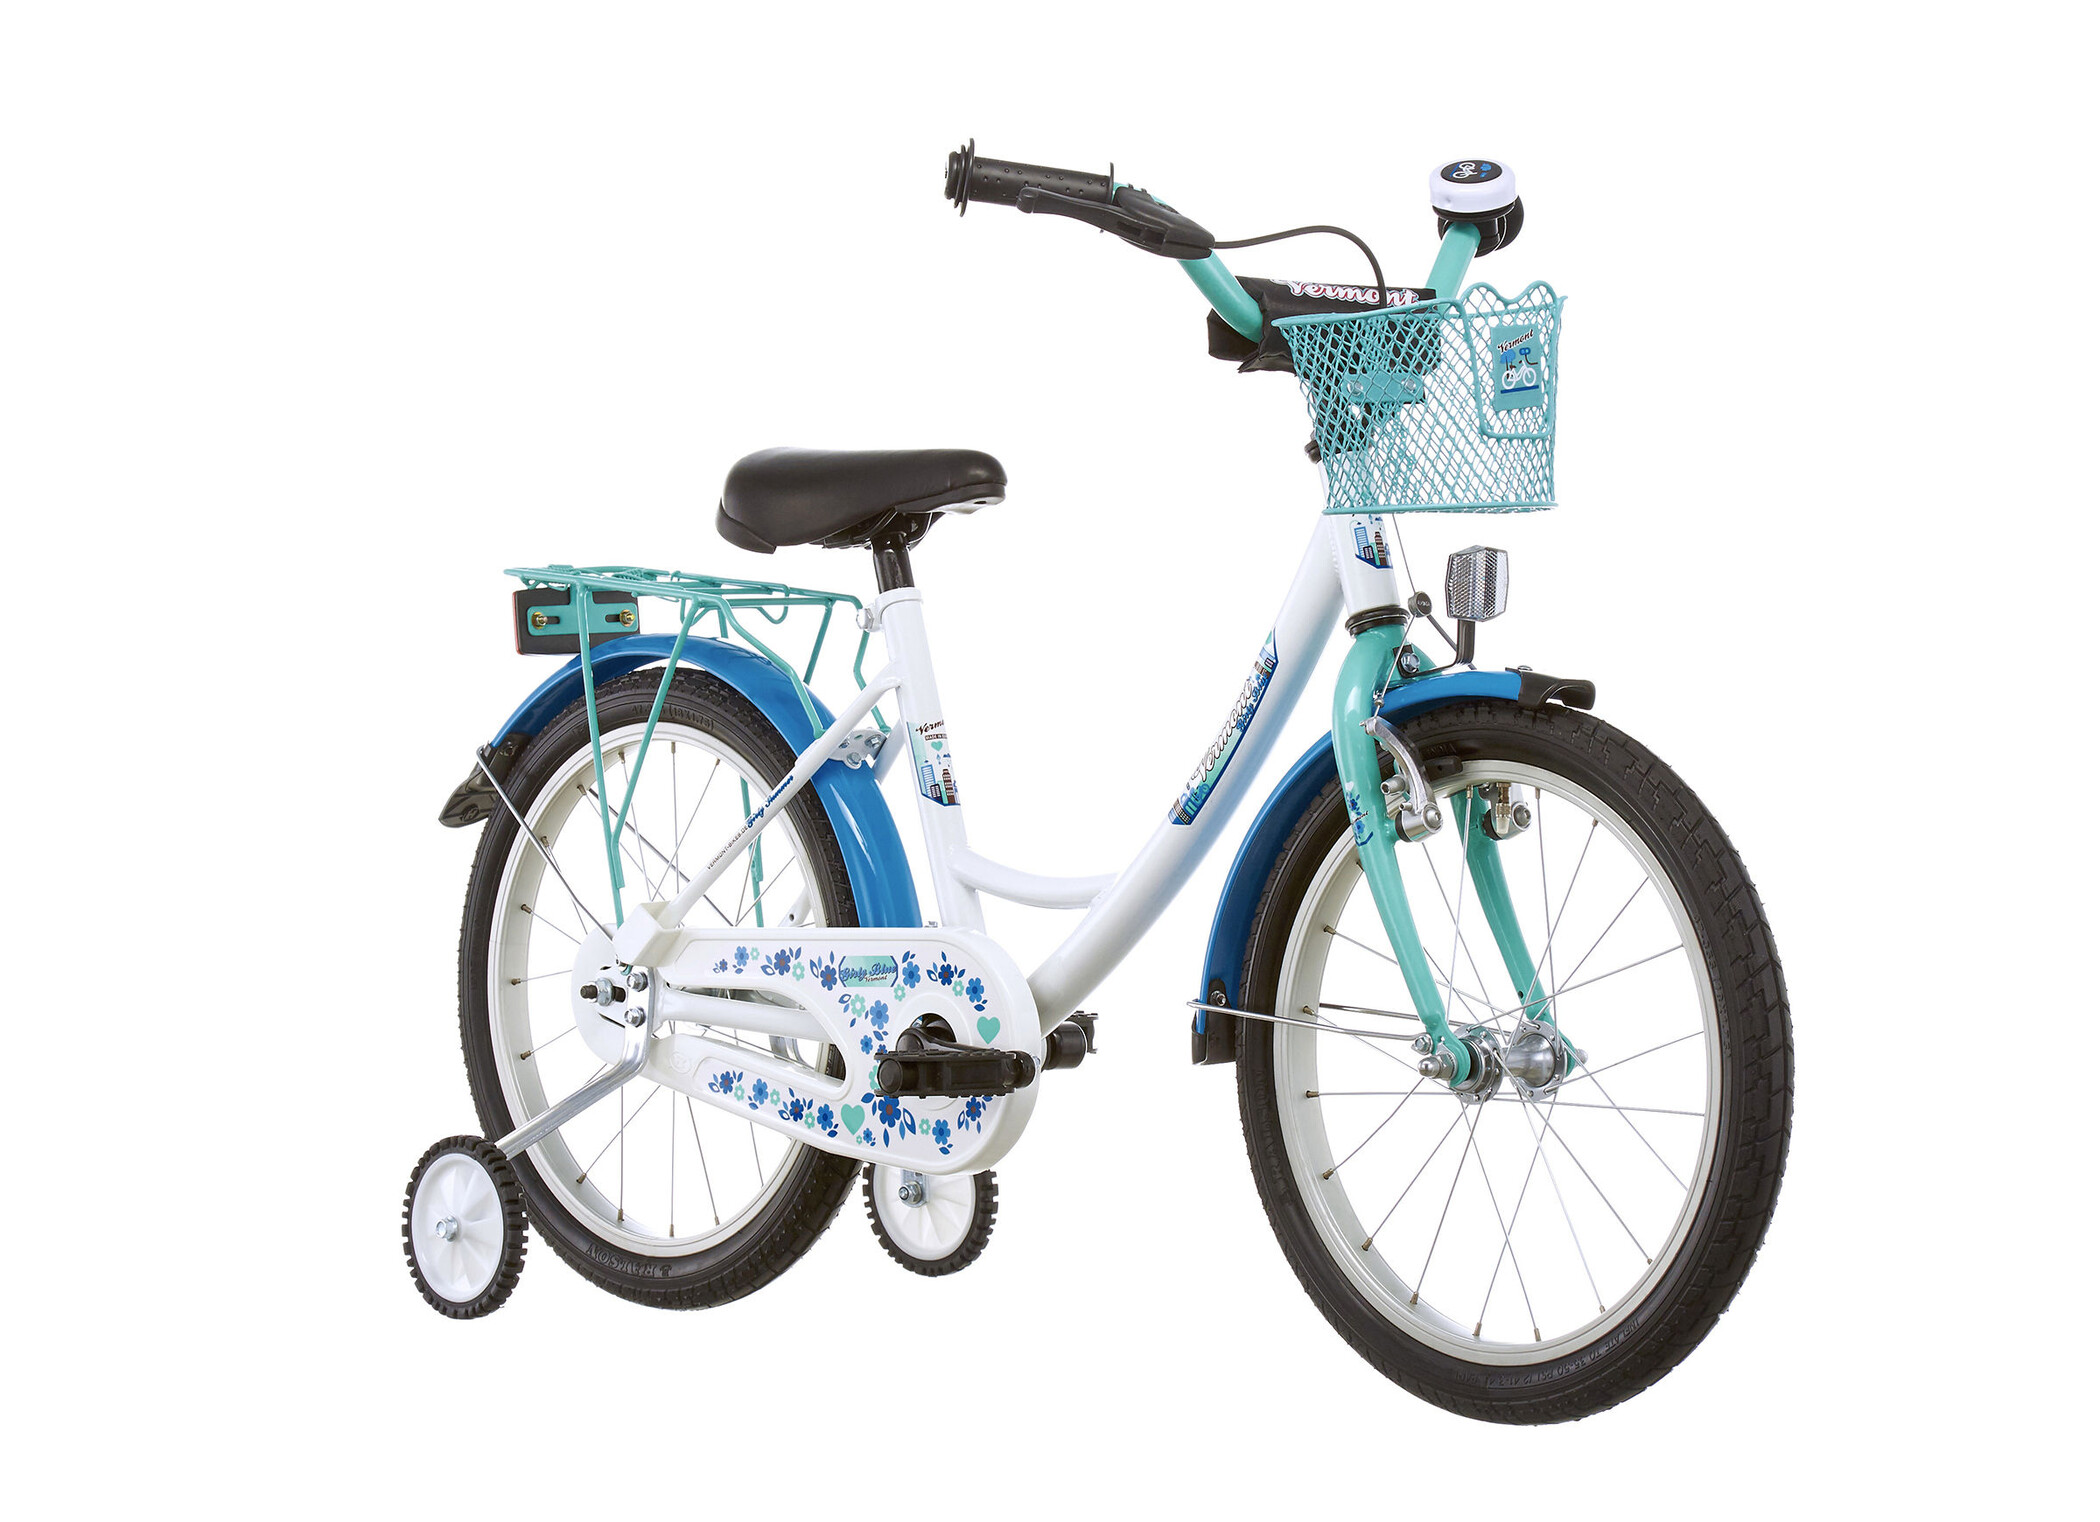 "Vermont Girly 18"" Børnecykel blå (2019) | City-cykler"